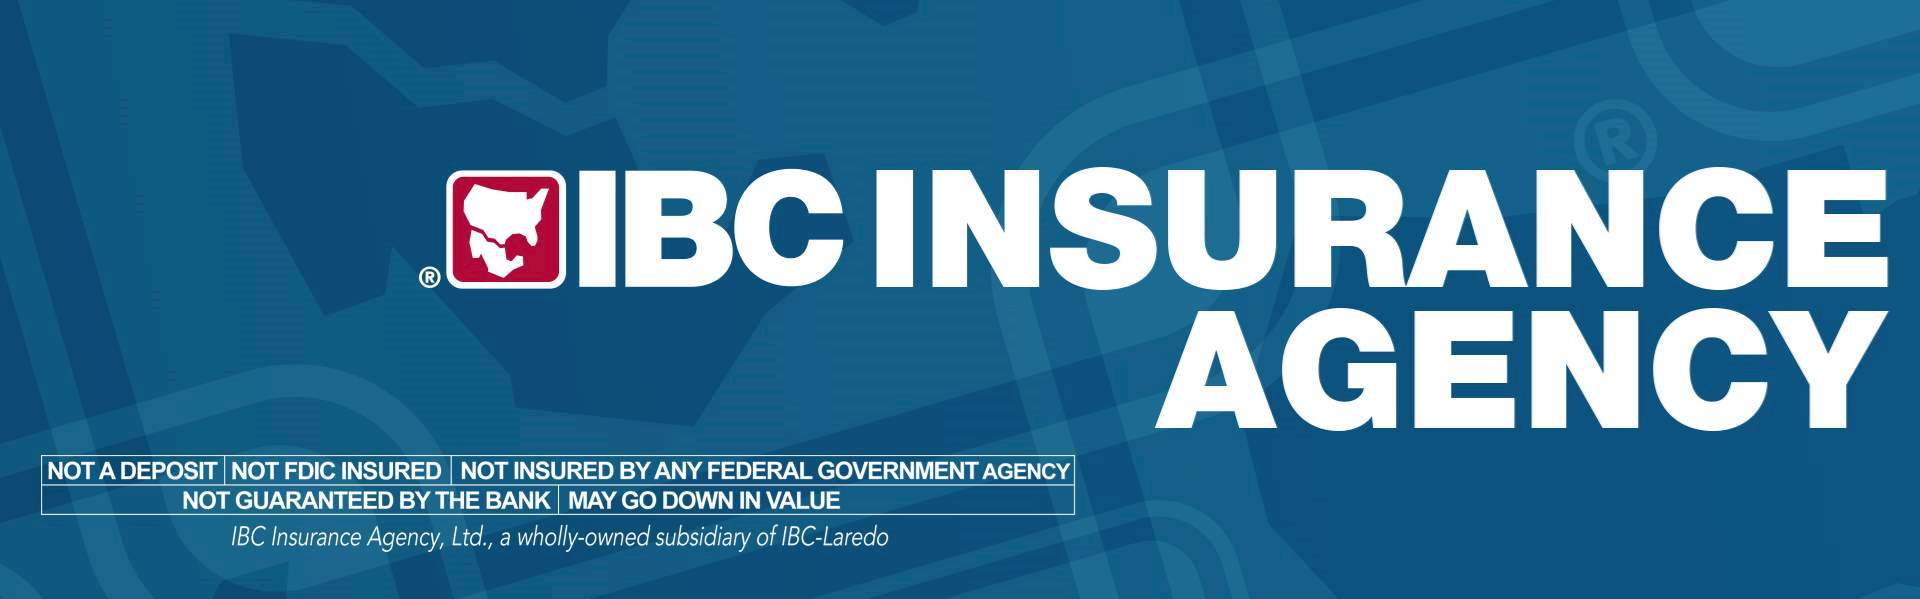 About IBC Insurance Agency, Ltd.